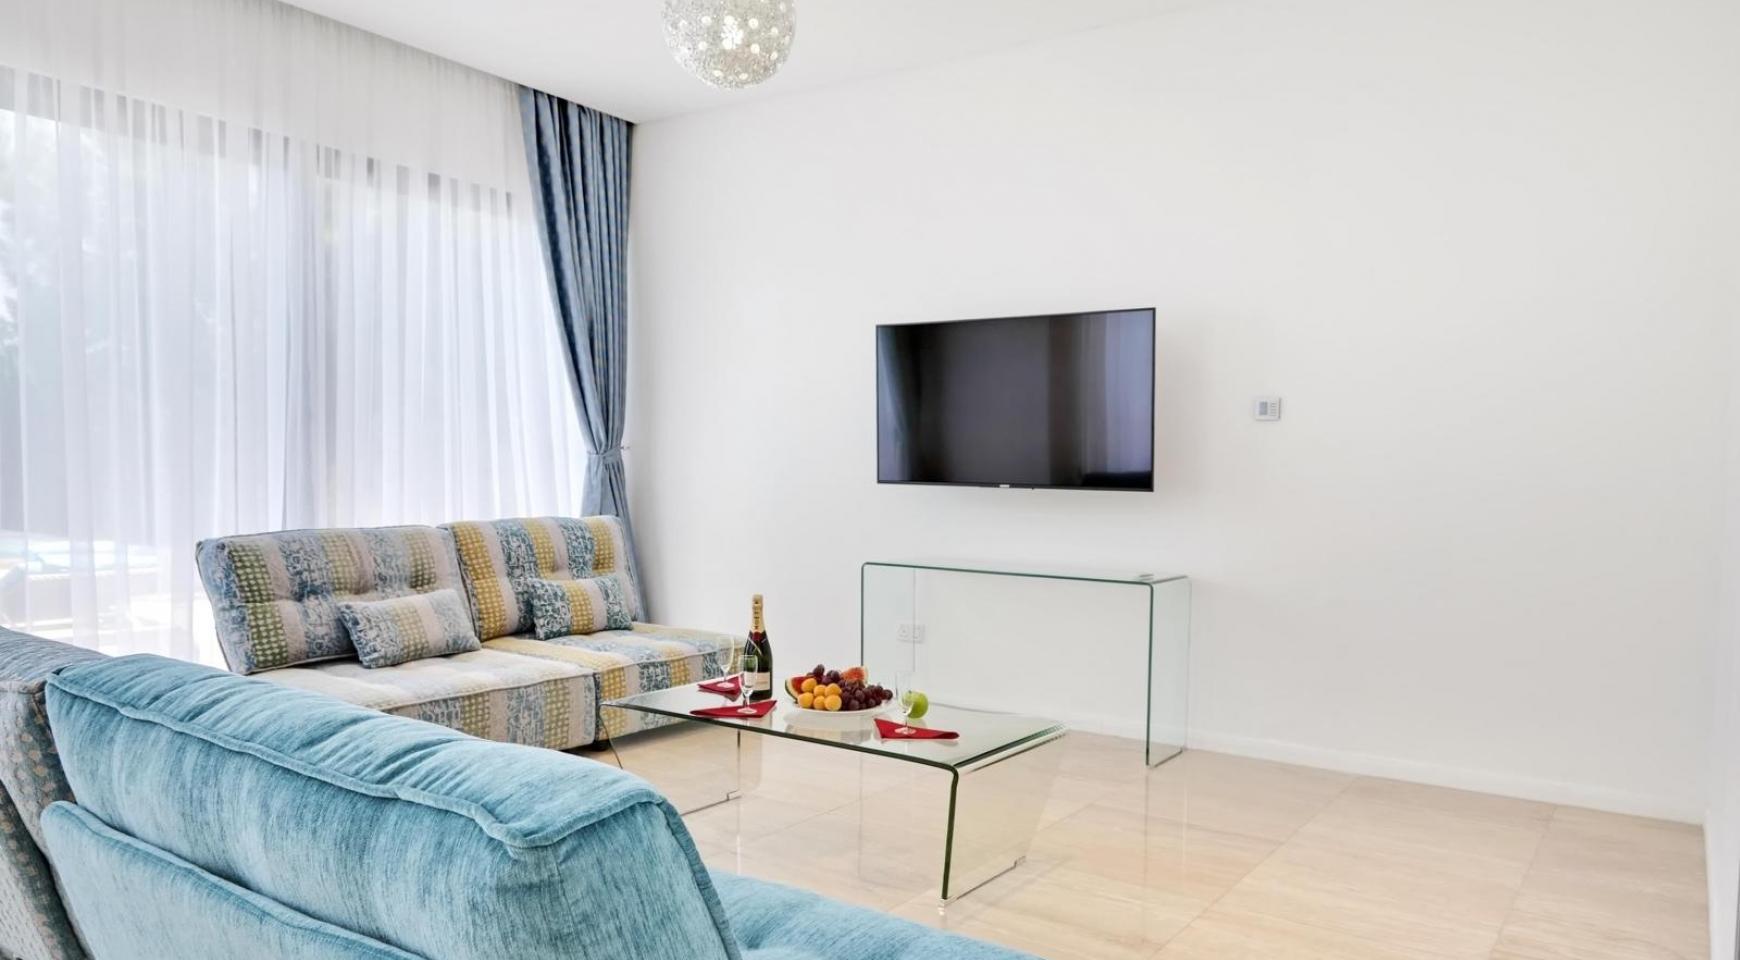 New Luxurious 4 Bedroom Villa in the Tourist Area - 17